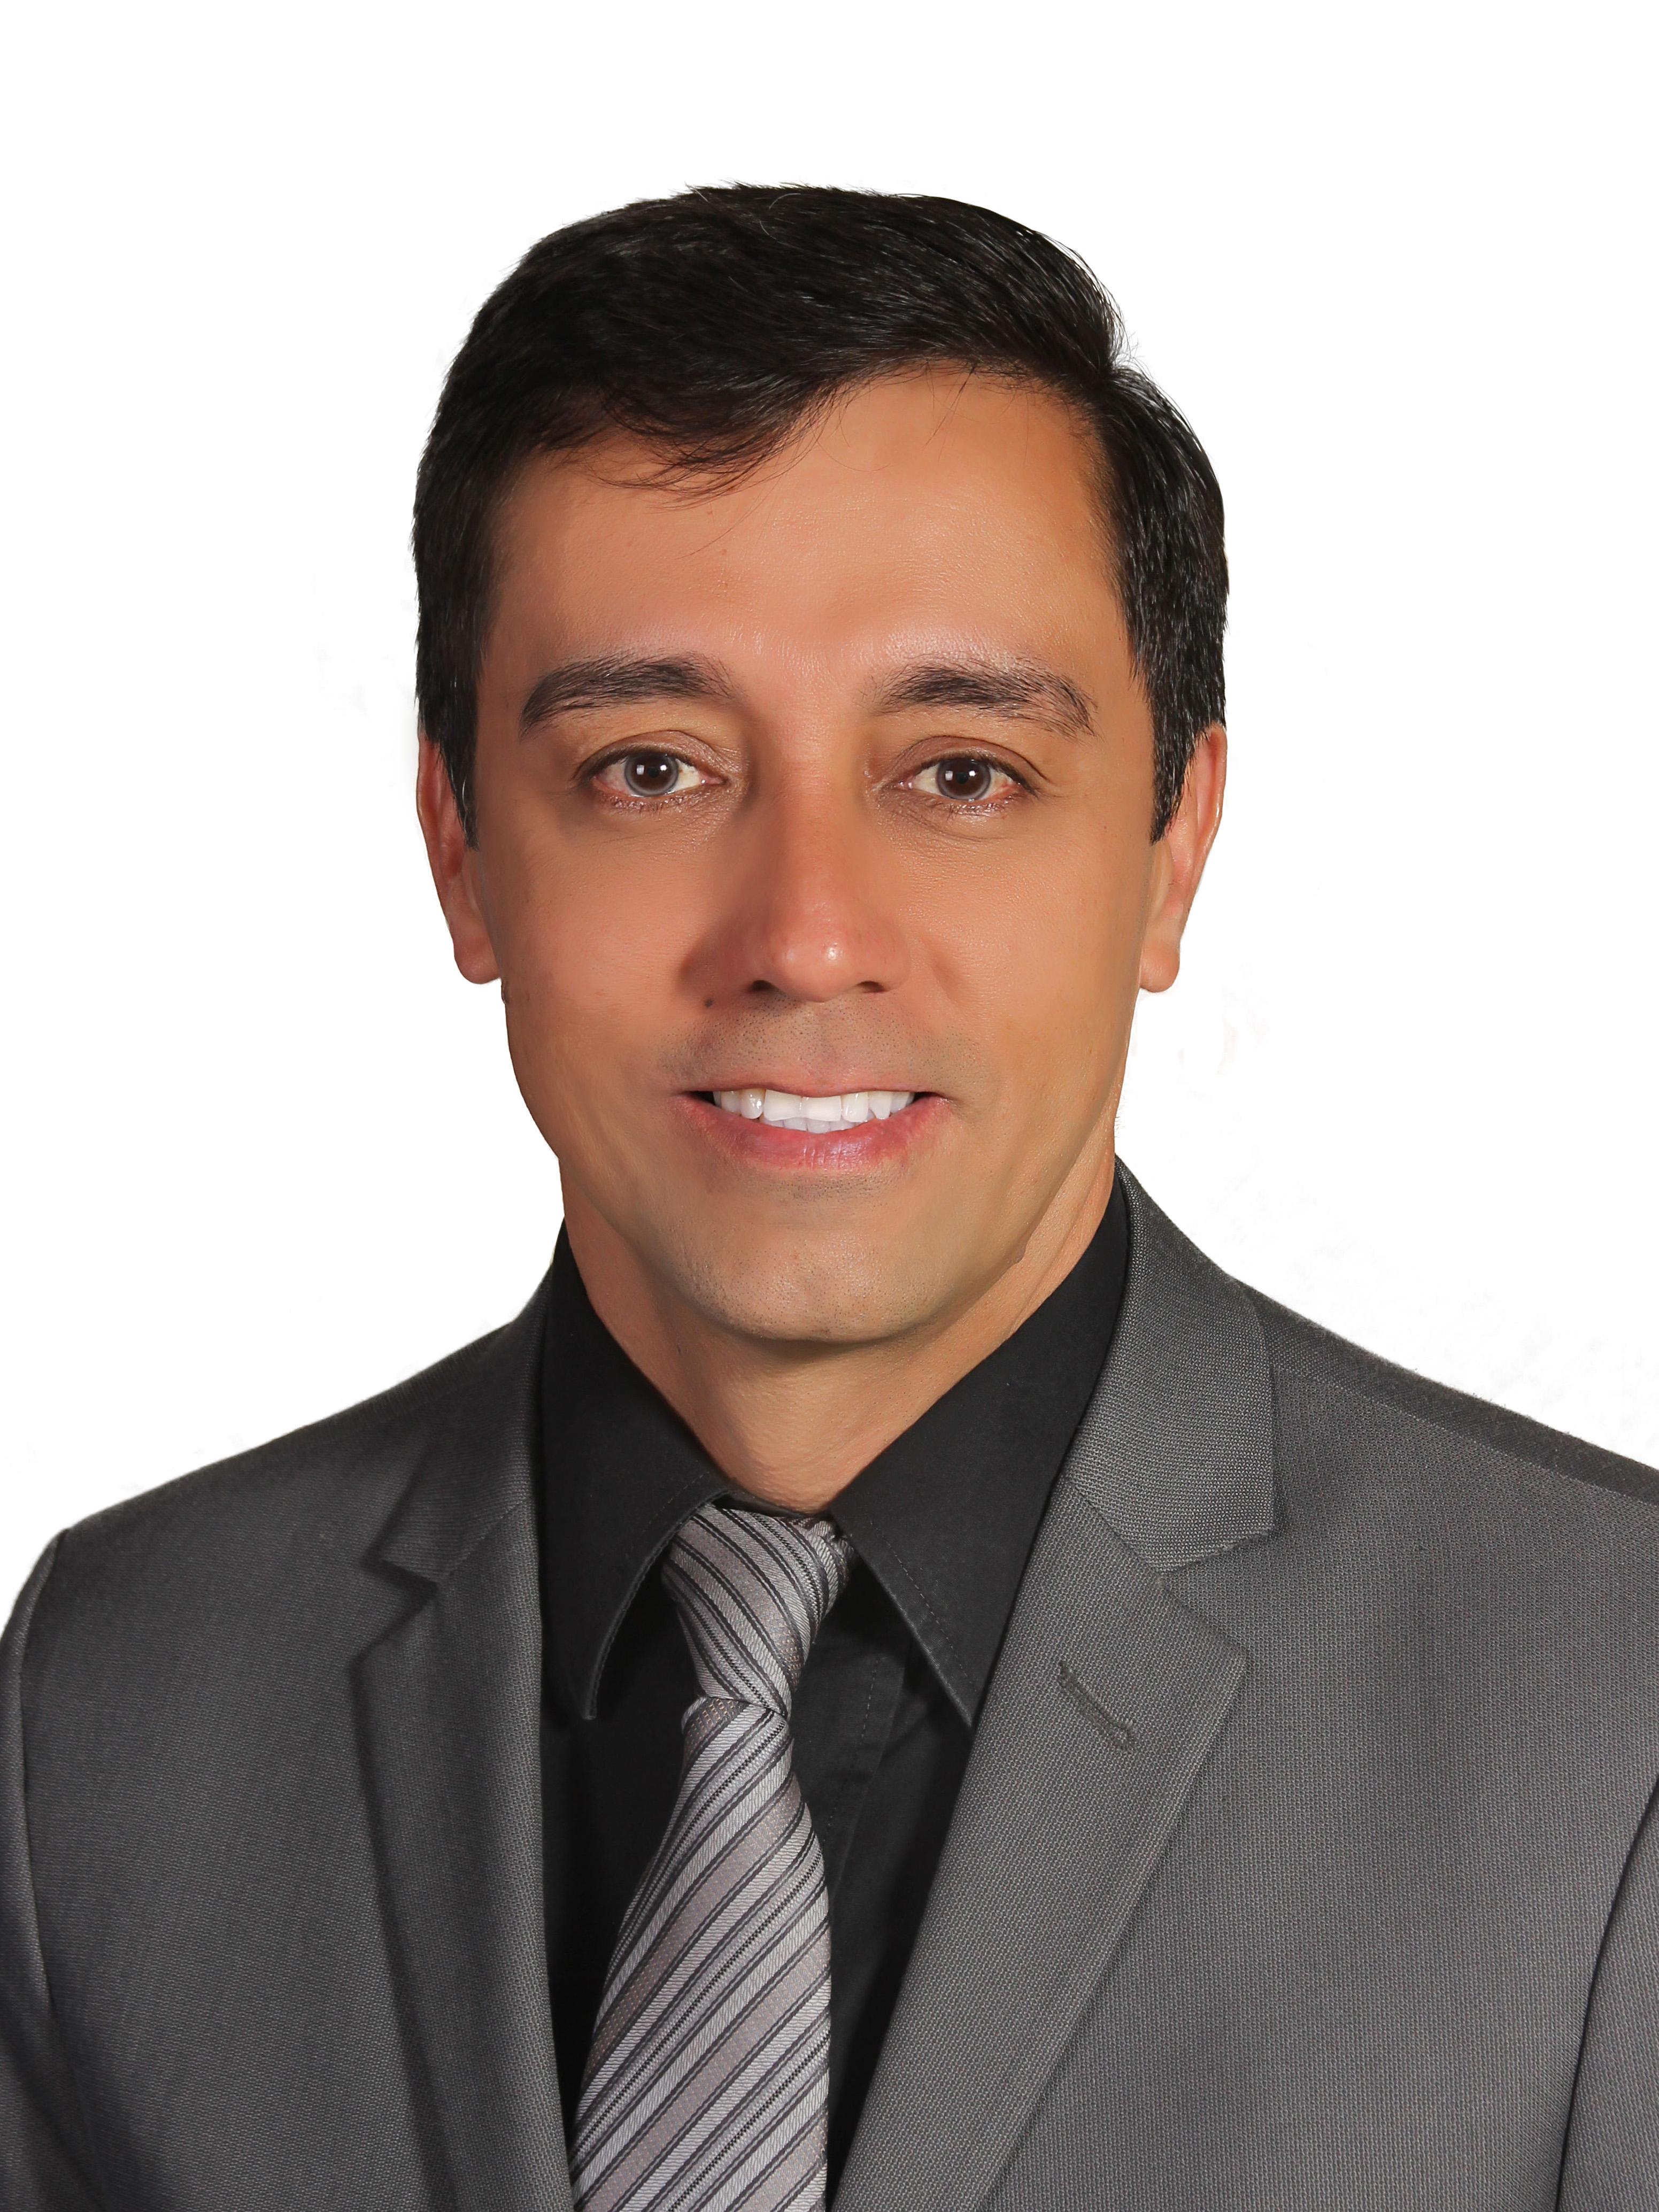 SERGIO ALBERTO PALACIOS CRISTANCHO